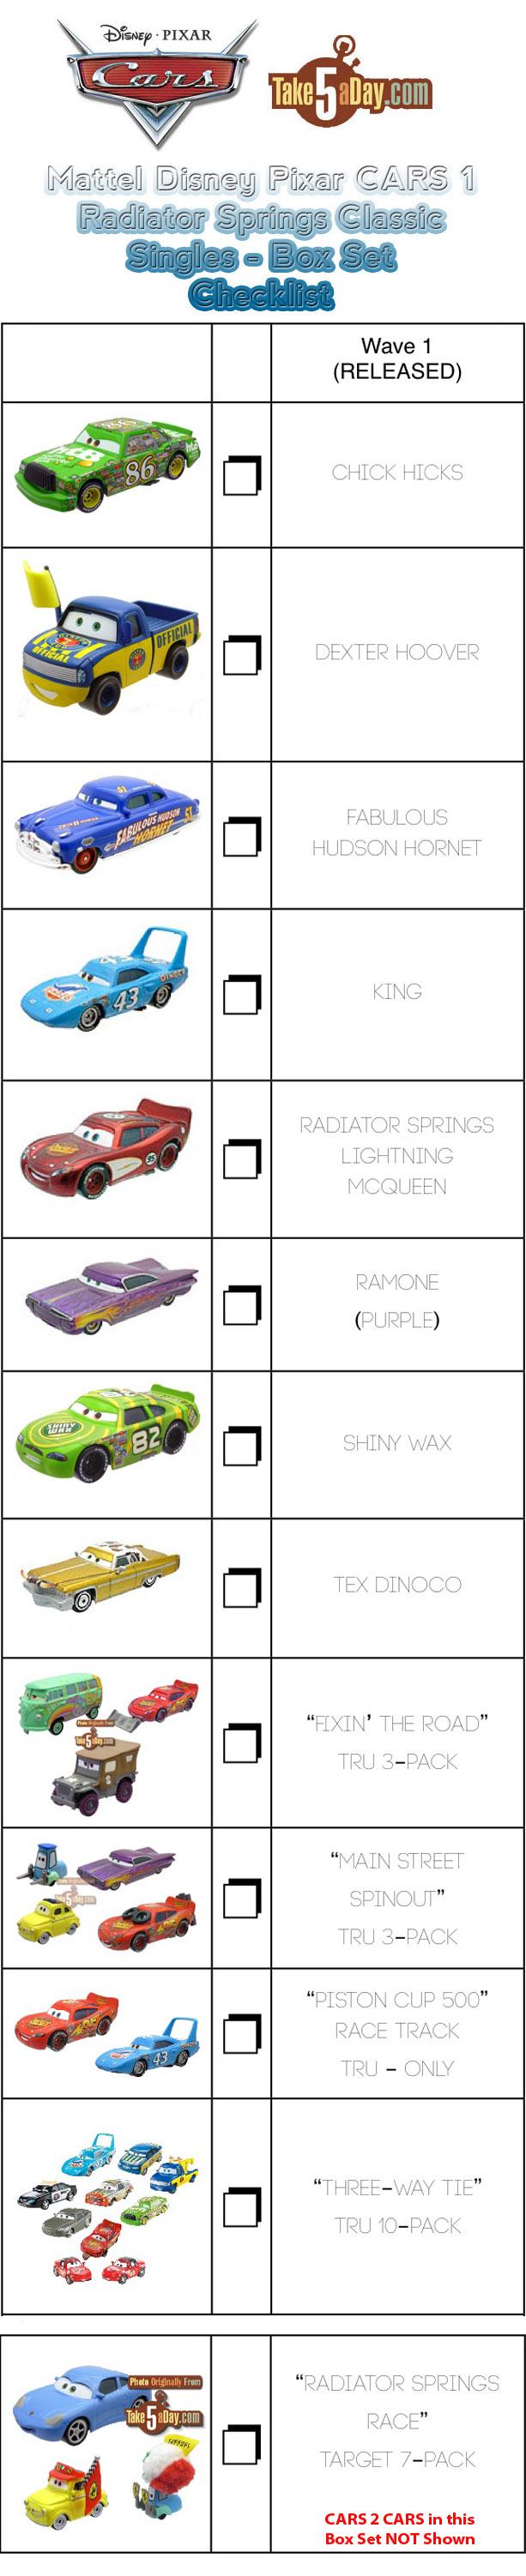 Design of a car radiator - Disney Cars Checklist With Pictures Mattel Disney Pixar Cars Radiator Springs Classic Cars 1